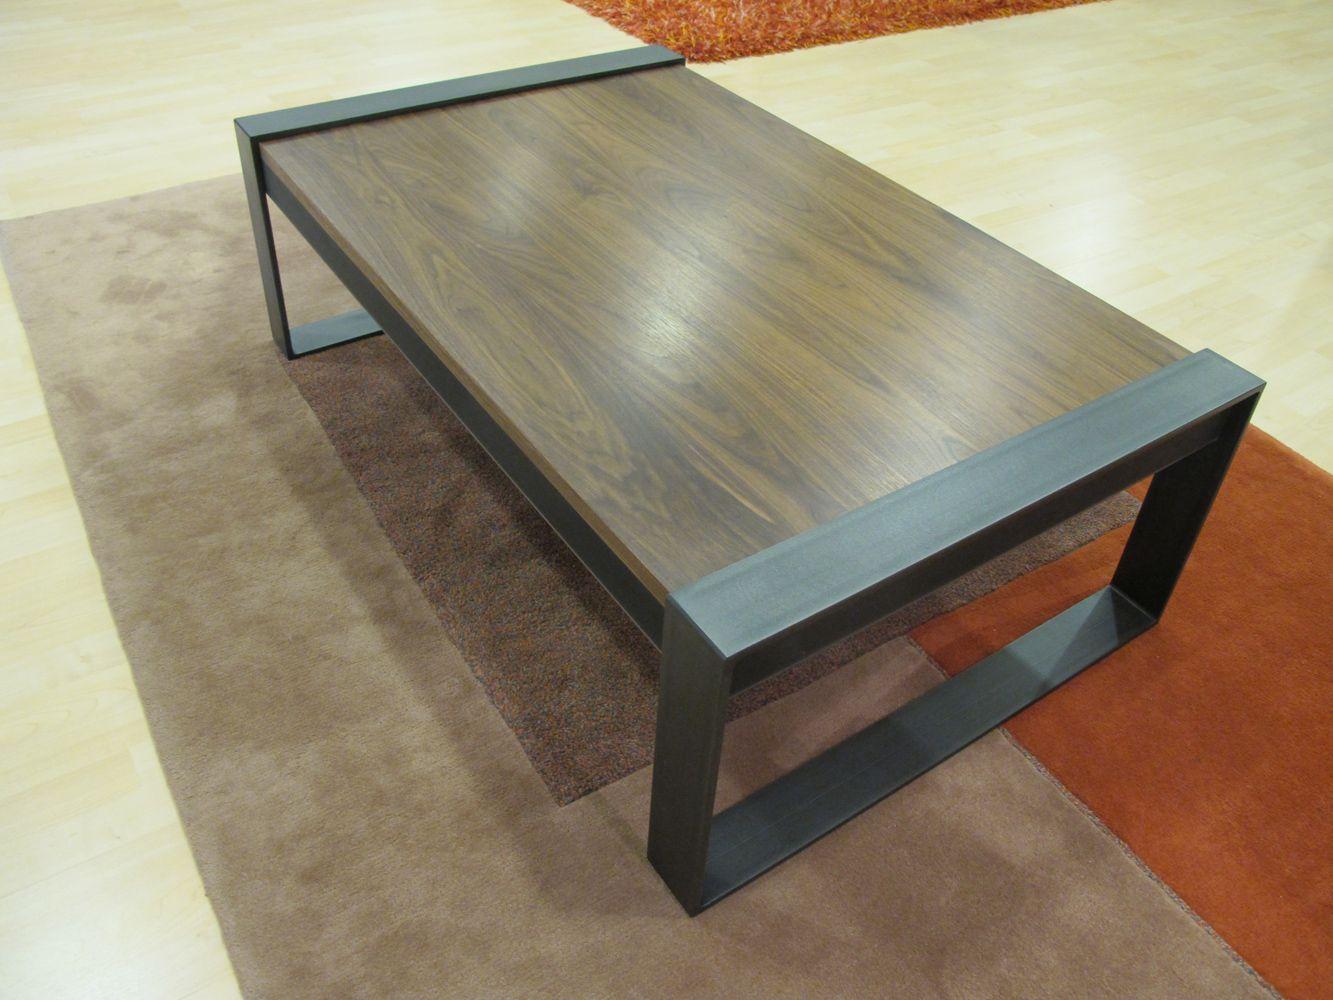 meuble tv orme massif excellent table de salle ronde glasgow victoria pin massif table orme. Black Bedroom Furniture Sets. Home Design Ideas